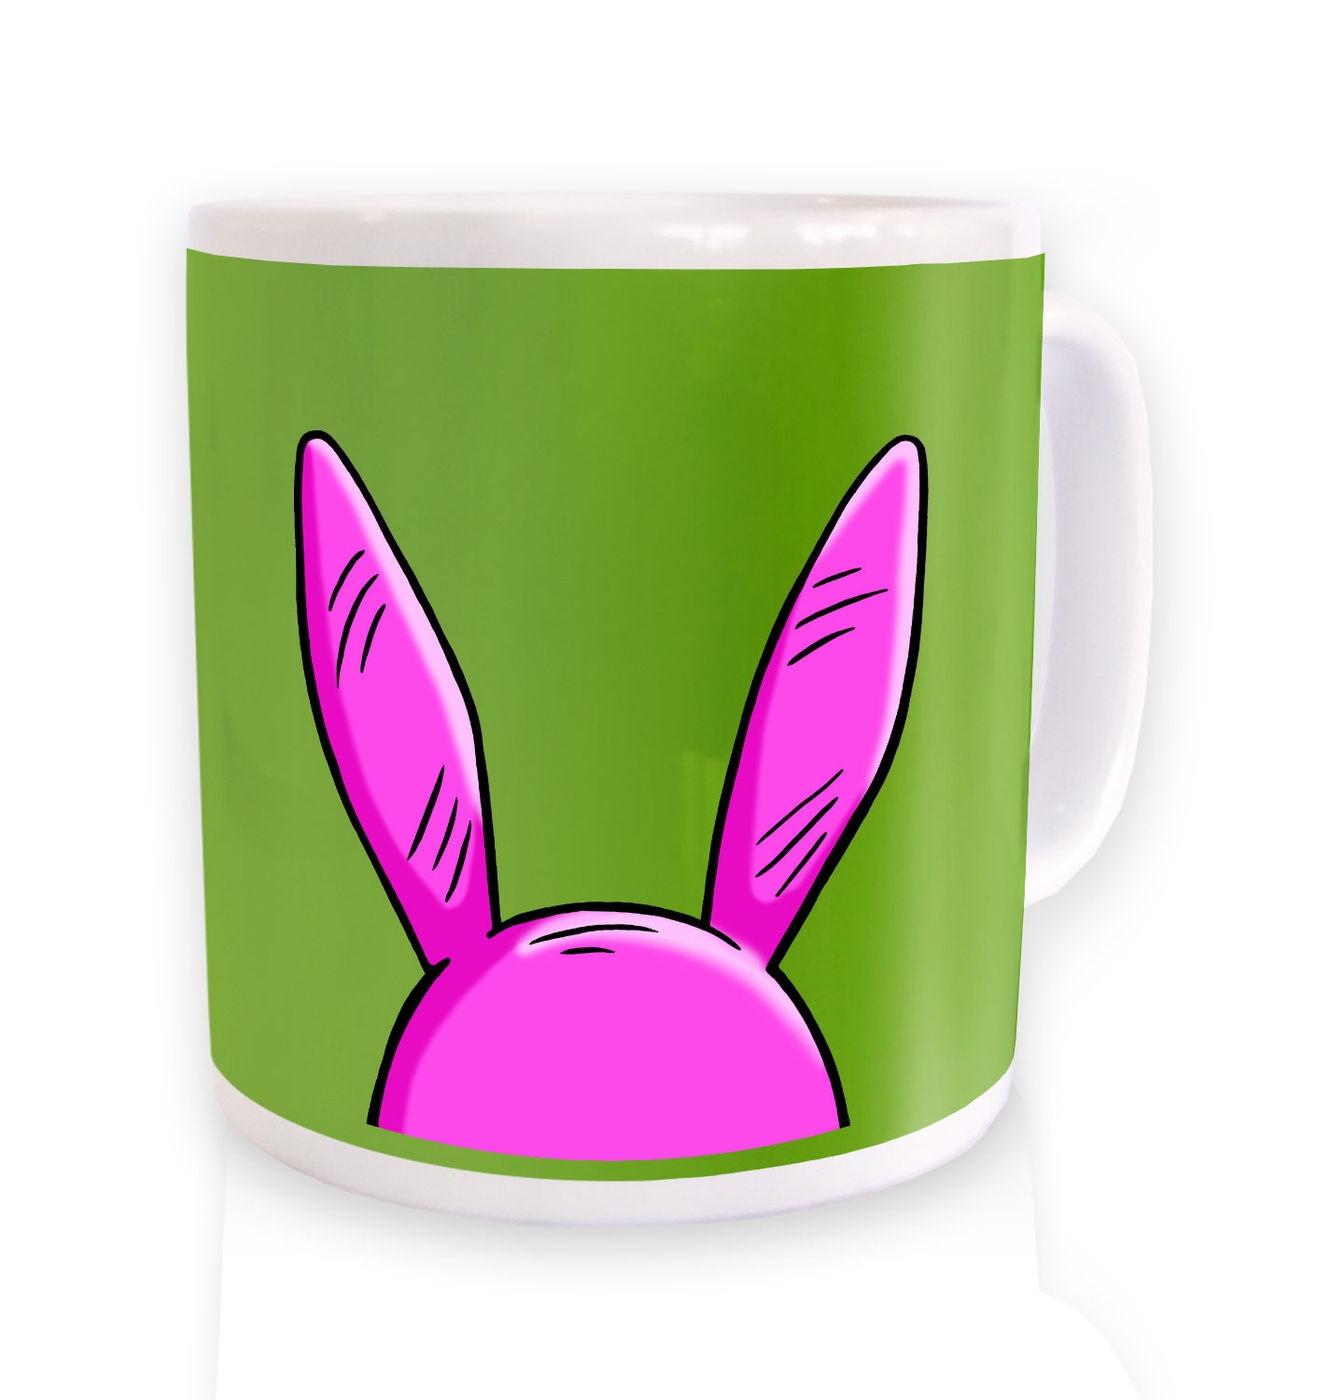 Louise Bunny Ears mug by Something Geeky